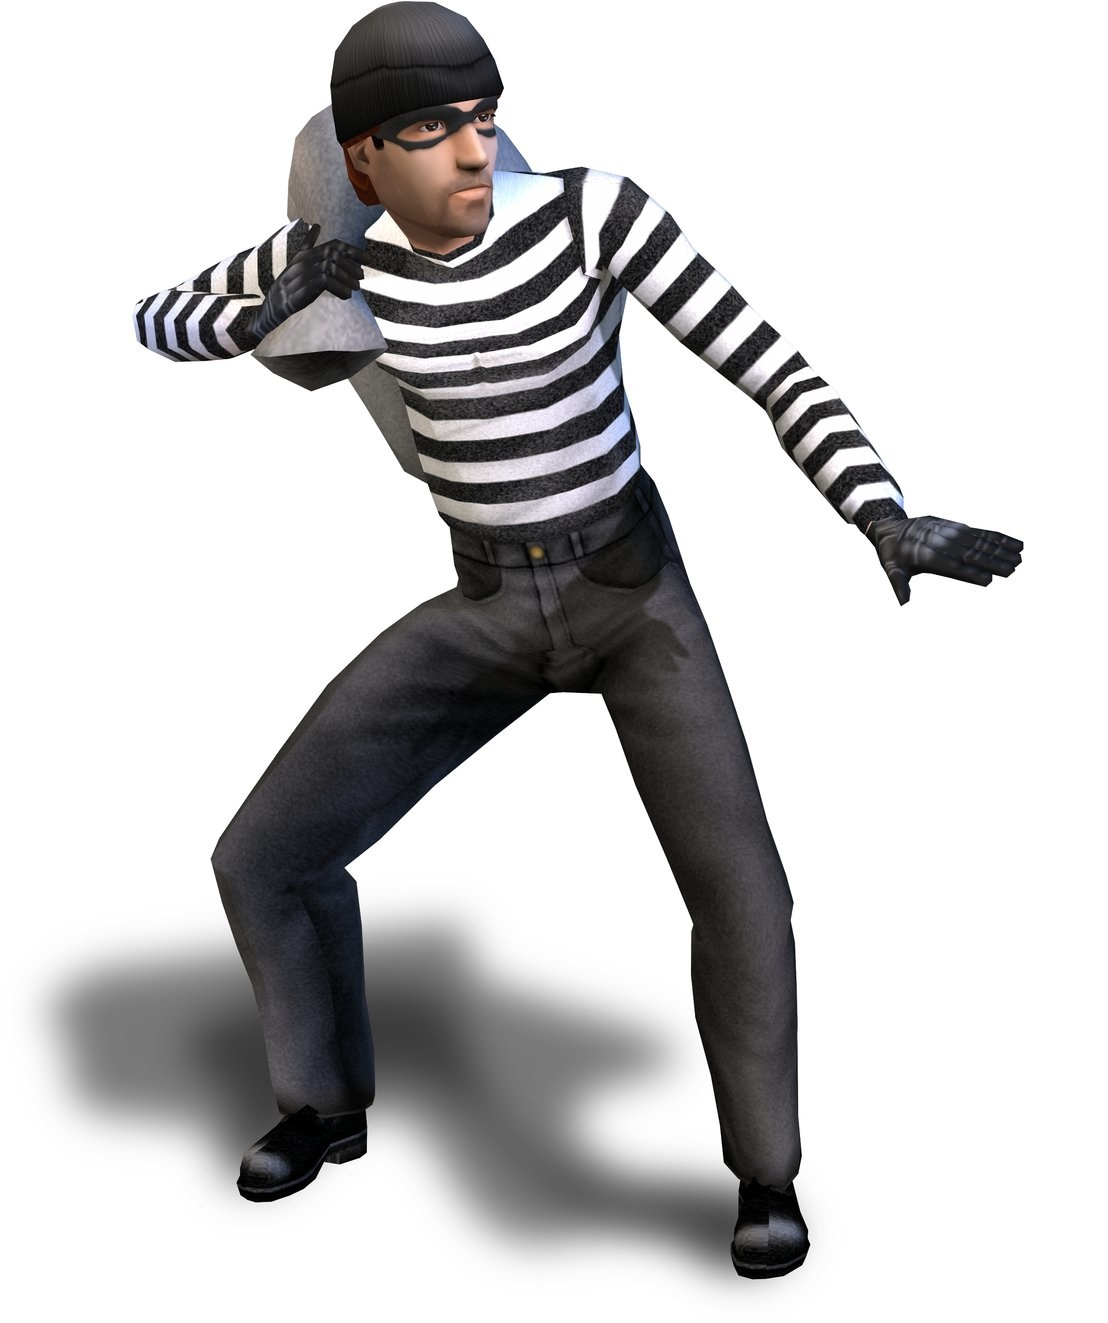 Burglar (The Sims)